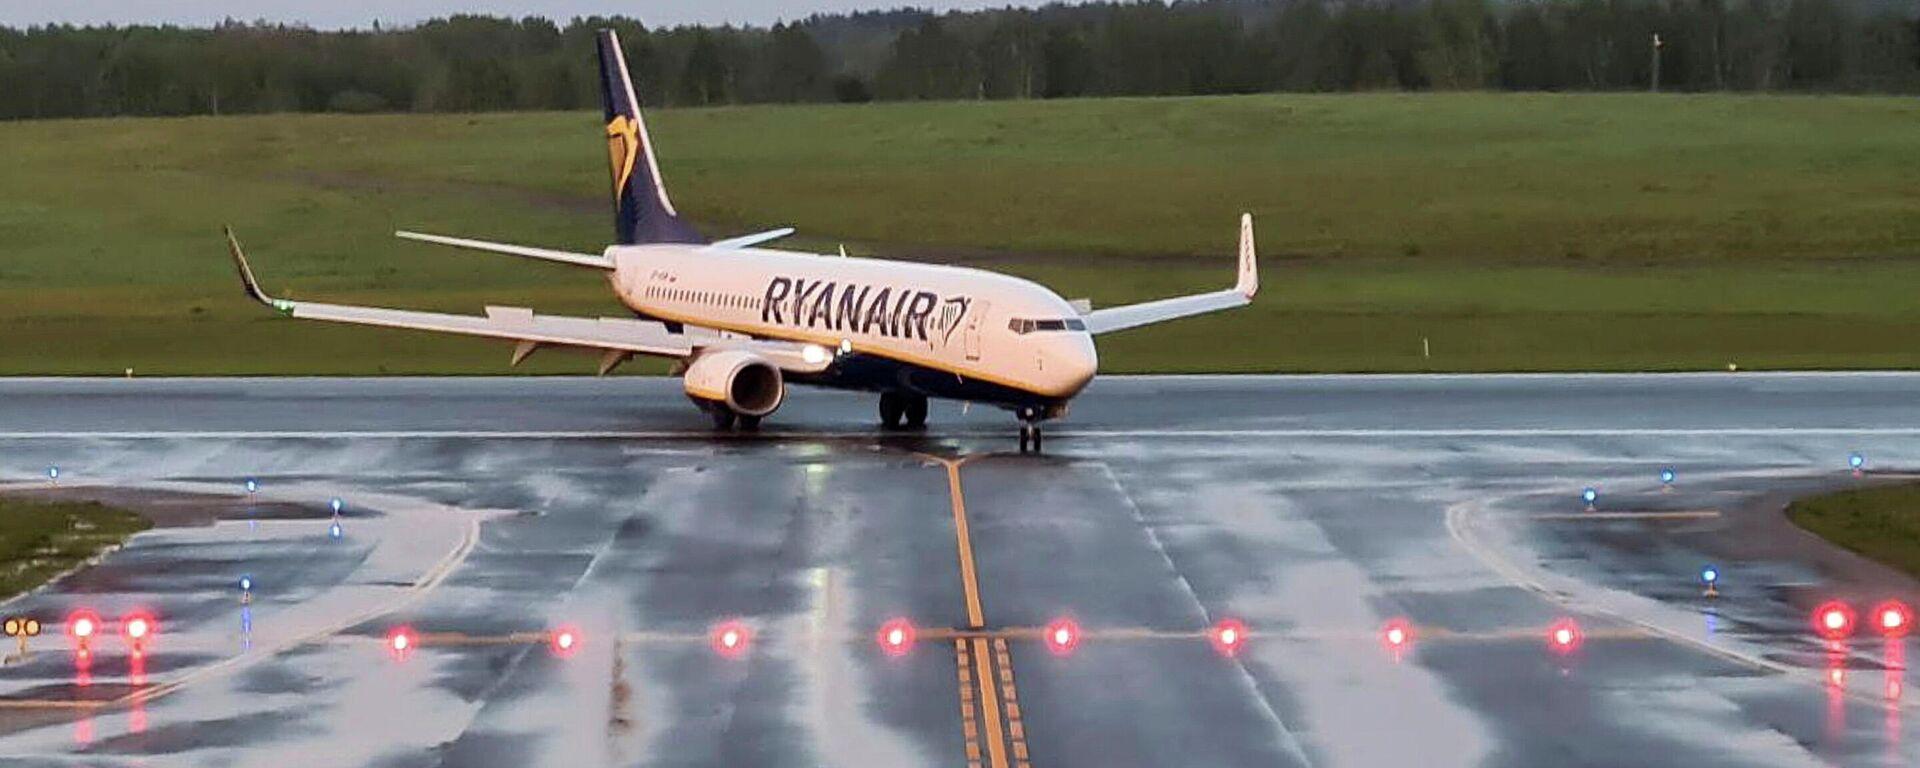 Avión de Ryanair  - Sputnik Mundo, 1920, 24.05.2021